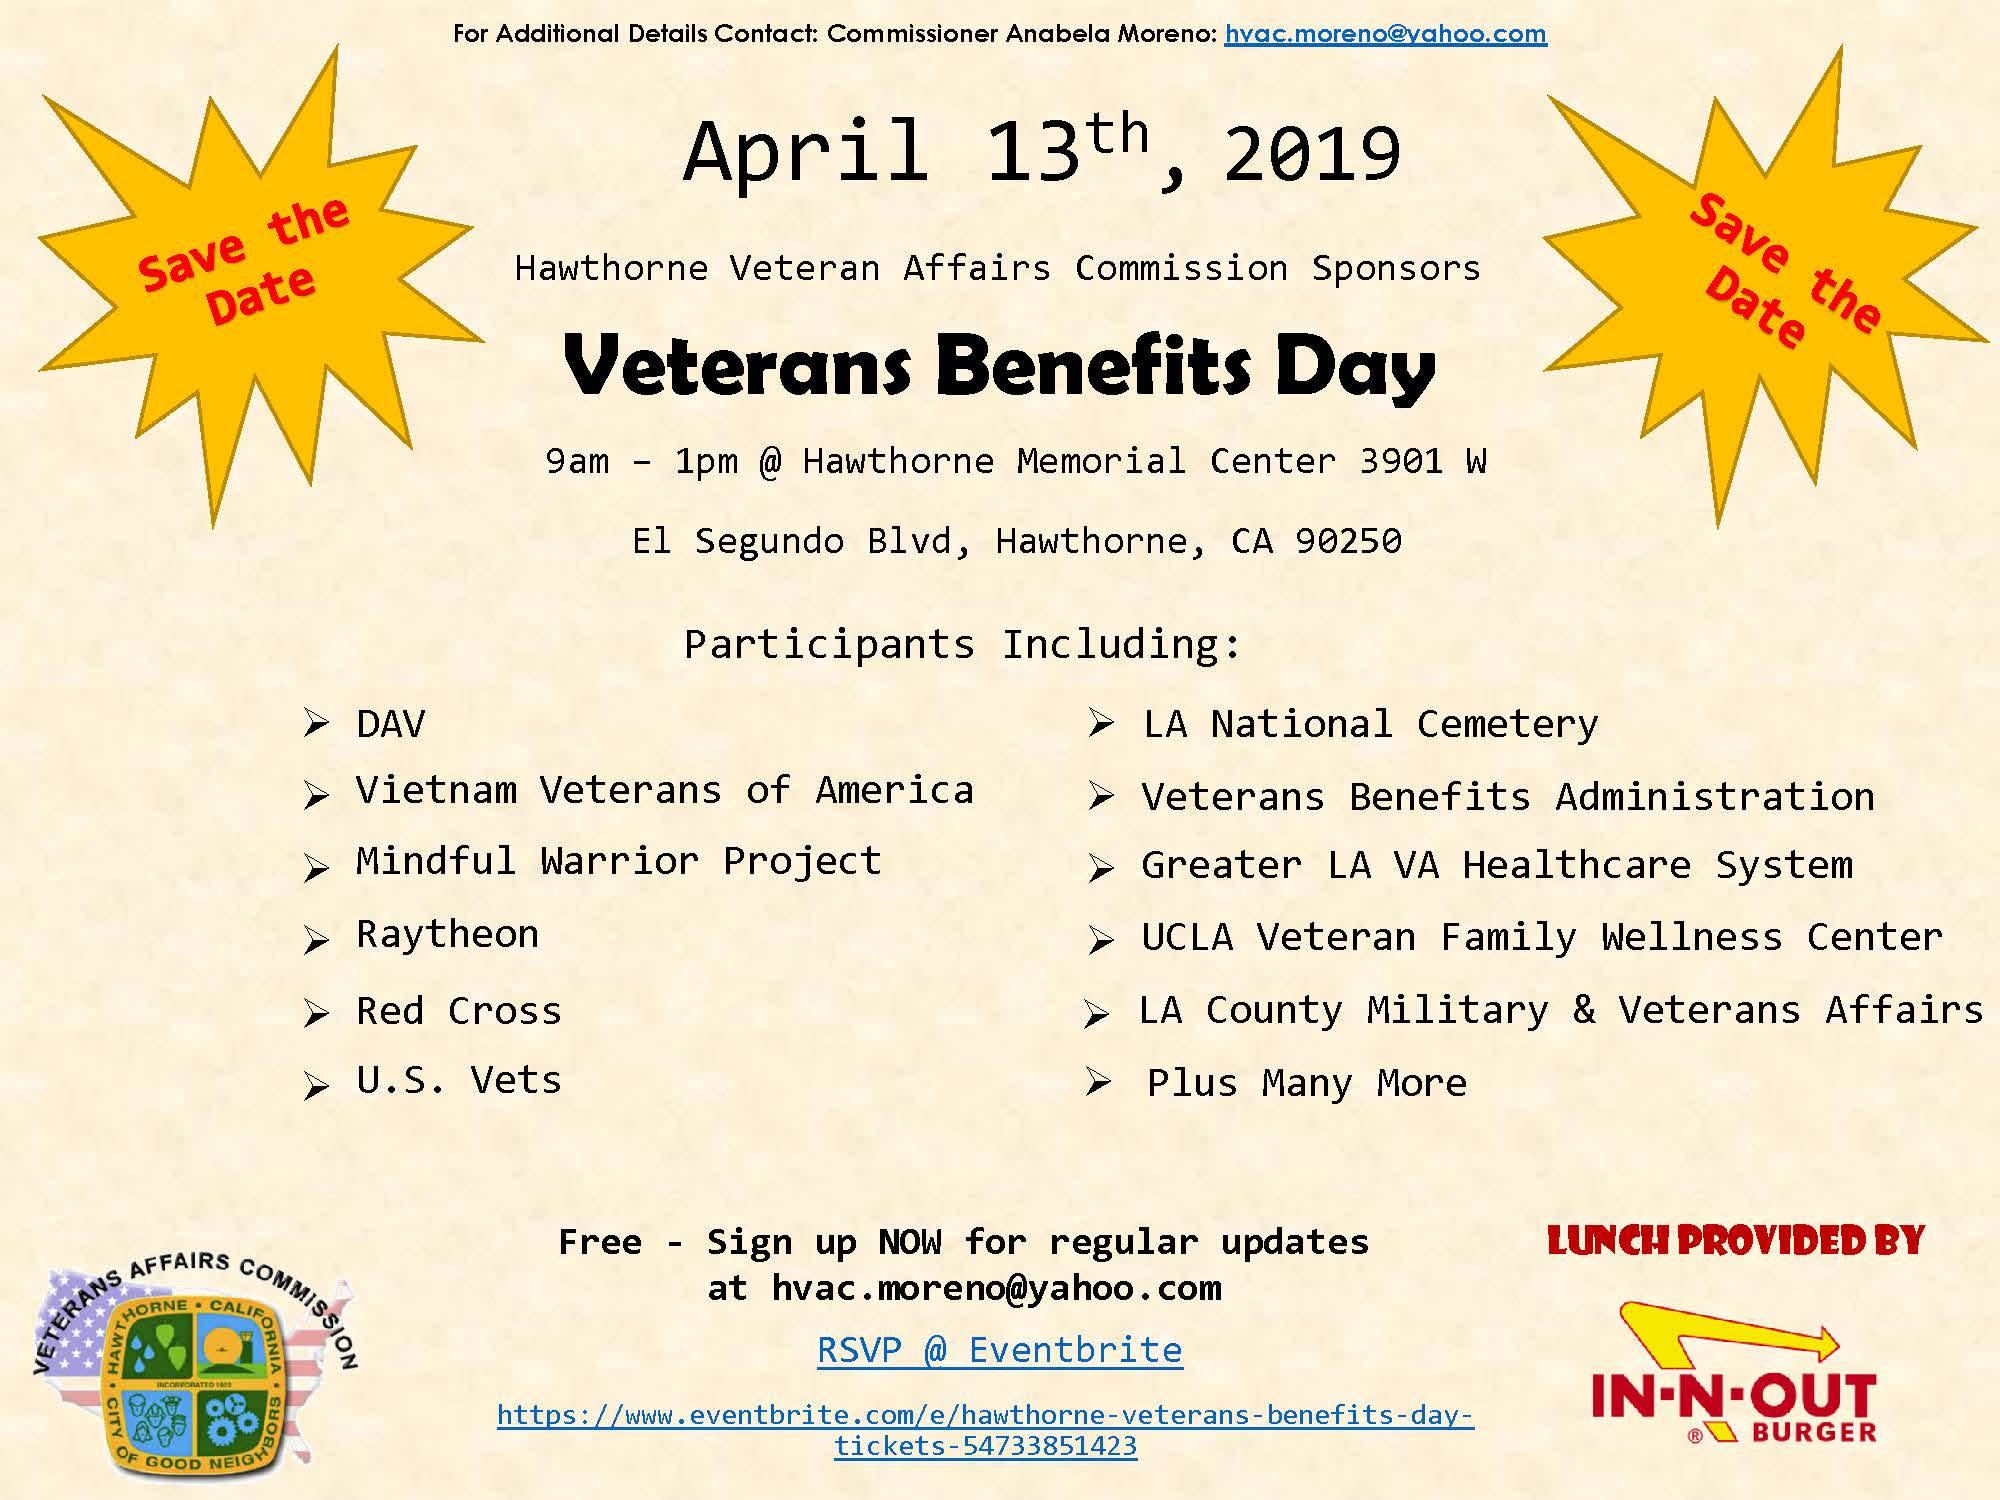 Veterans Benefits Day